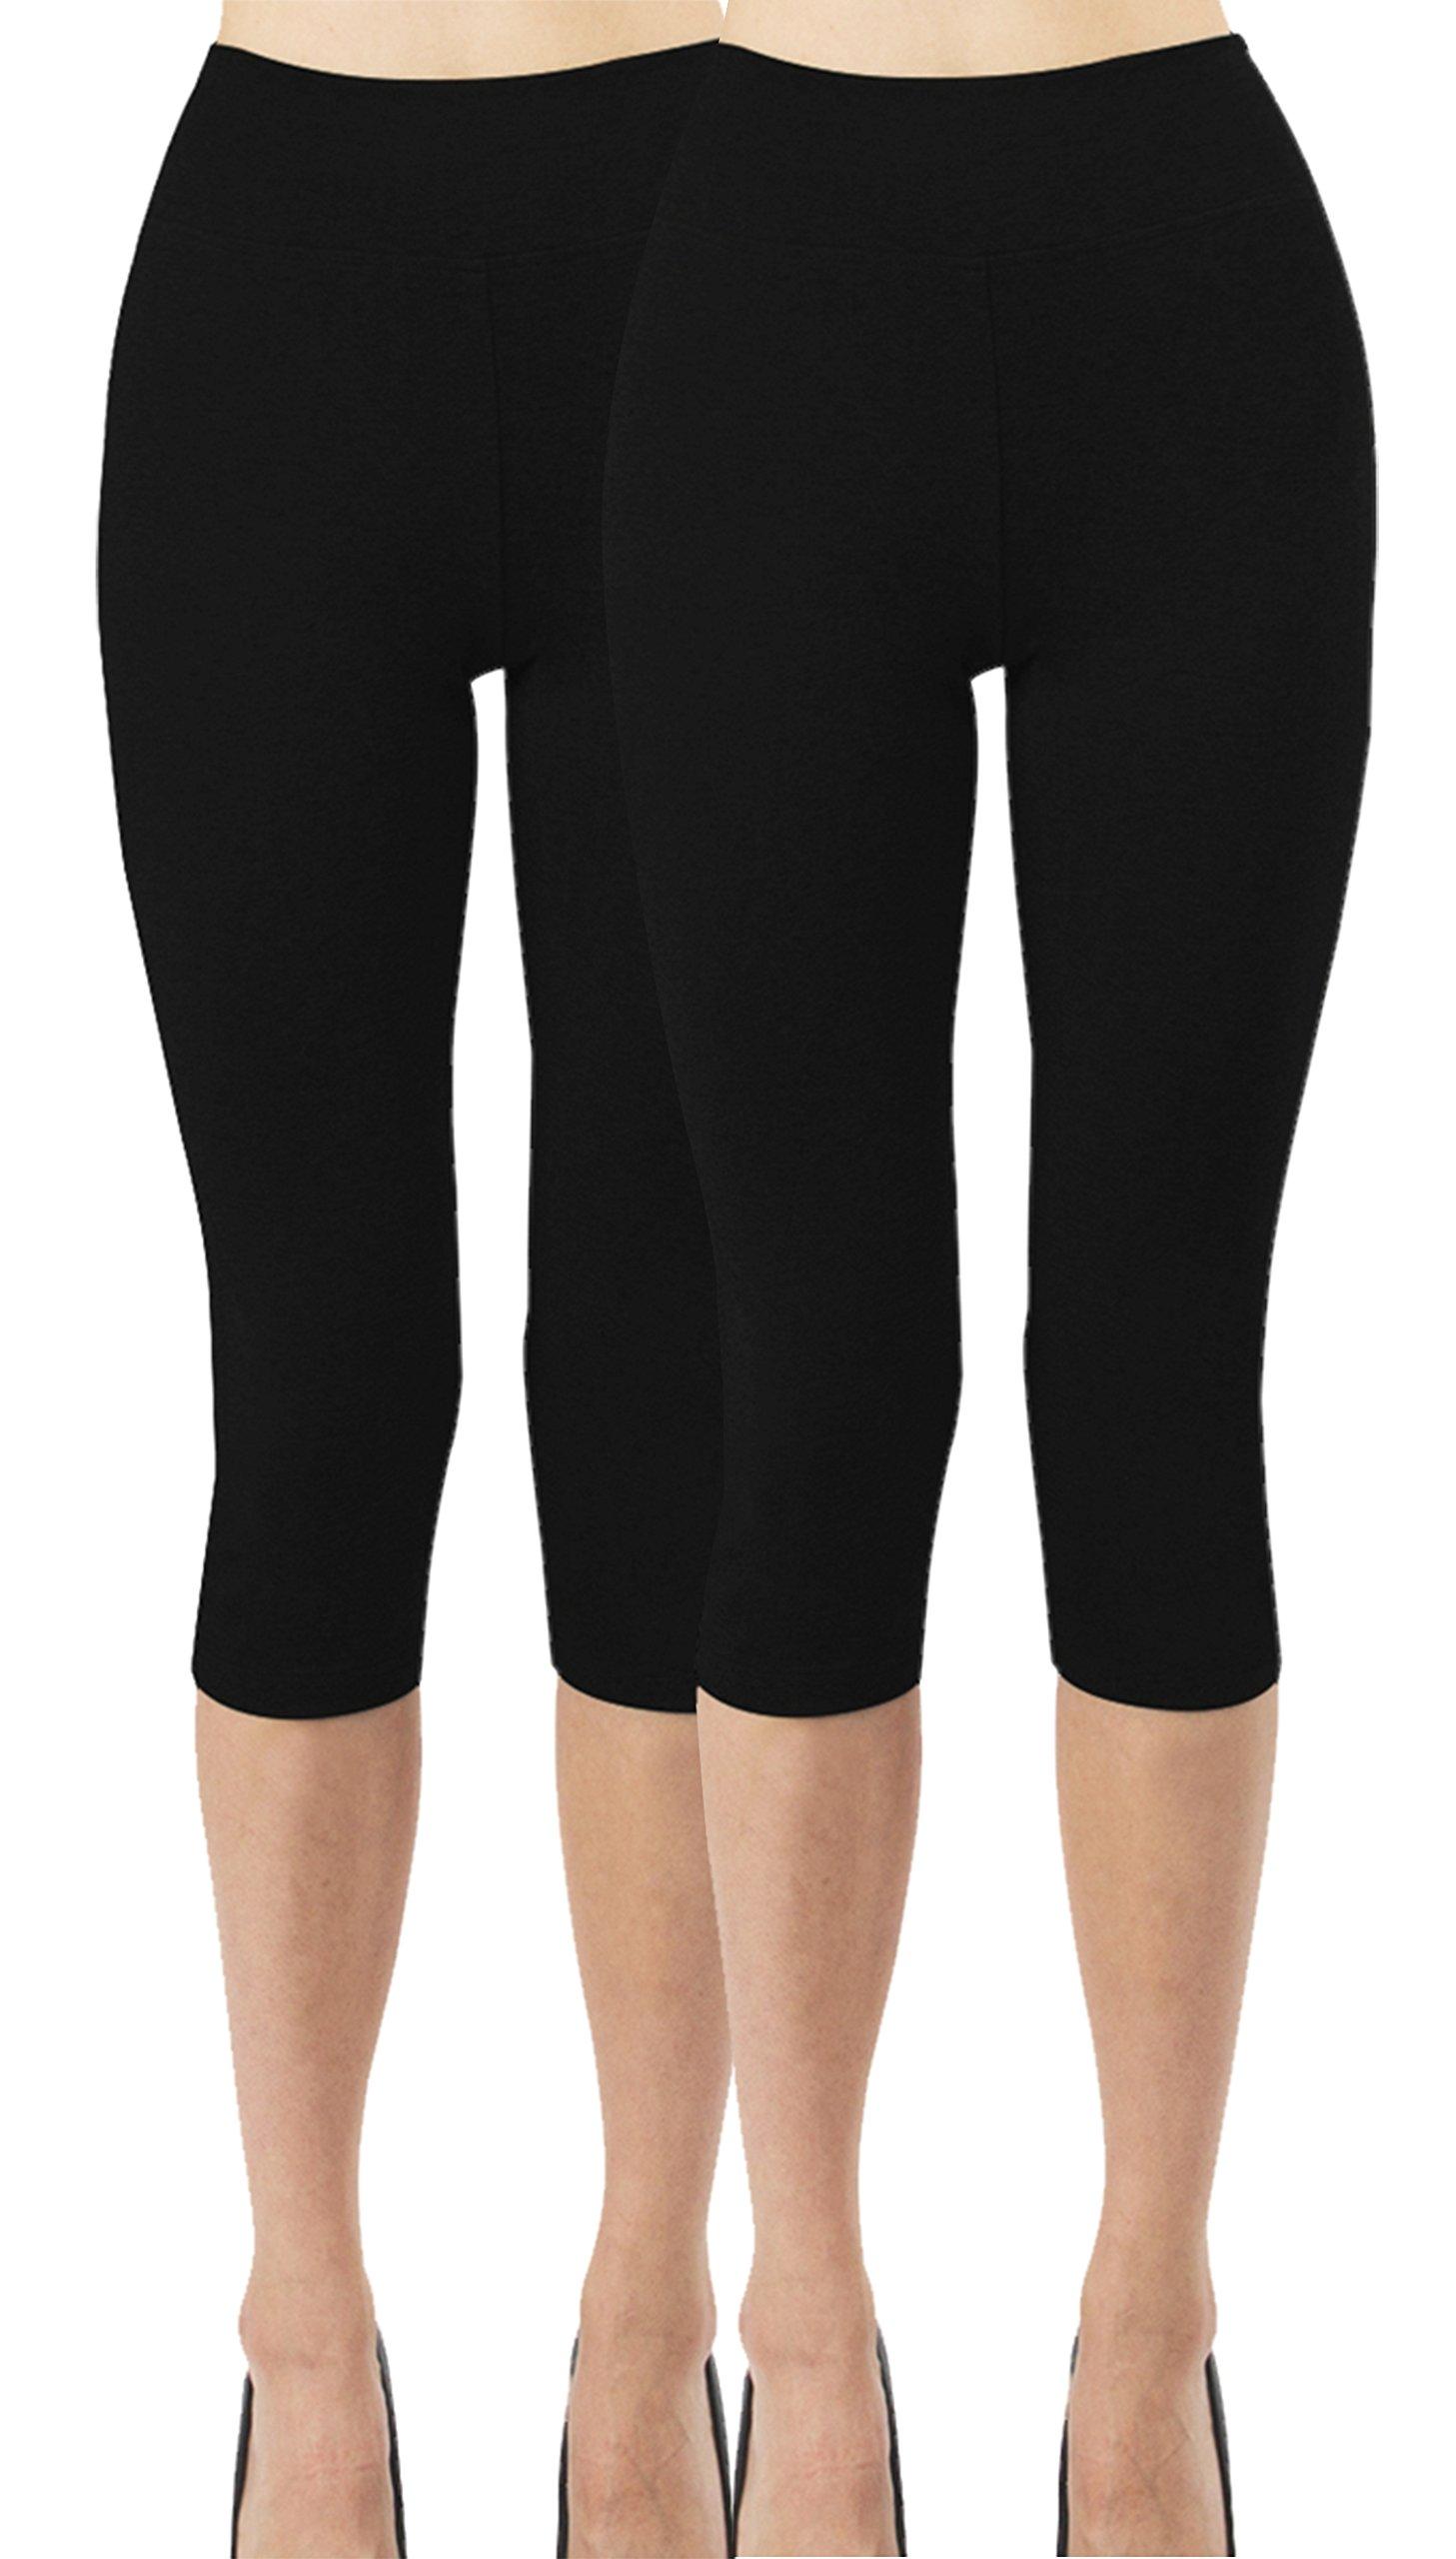 iLoveSIA 2PACK Women's Capri 3/4 Leggings Size XL Black+Black